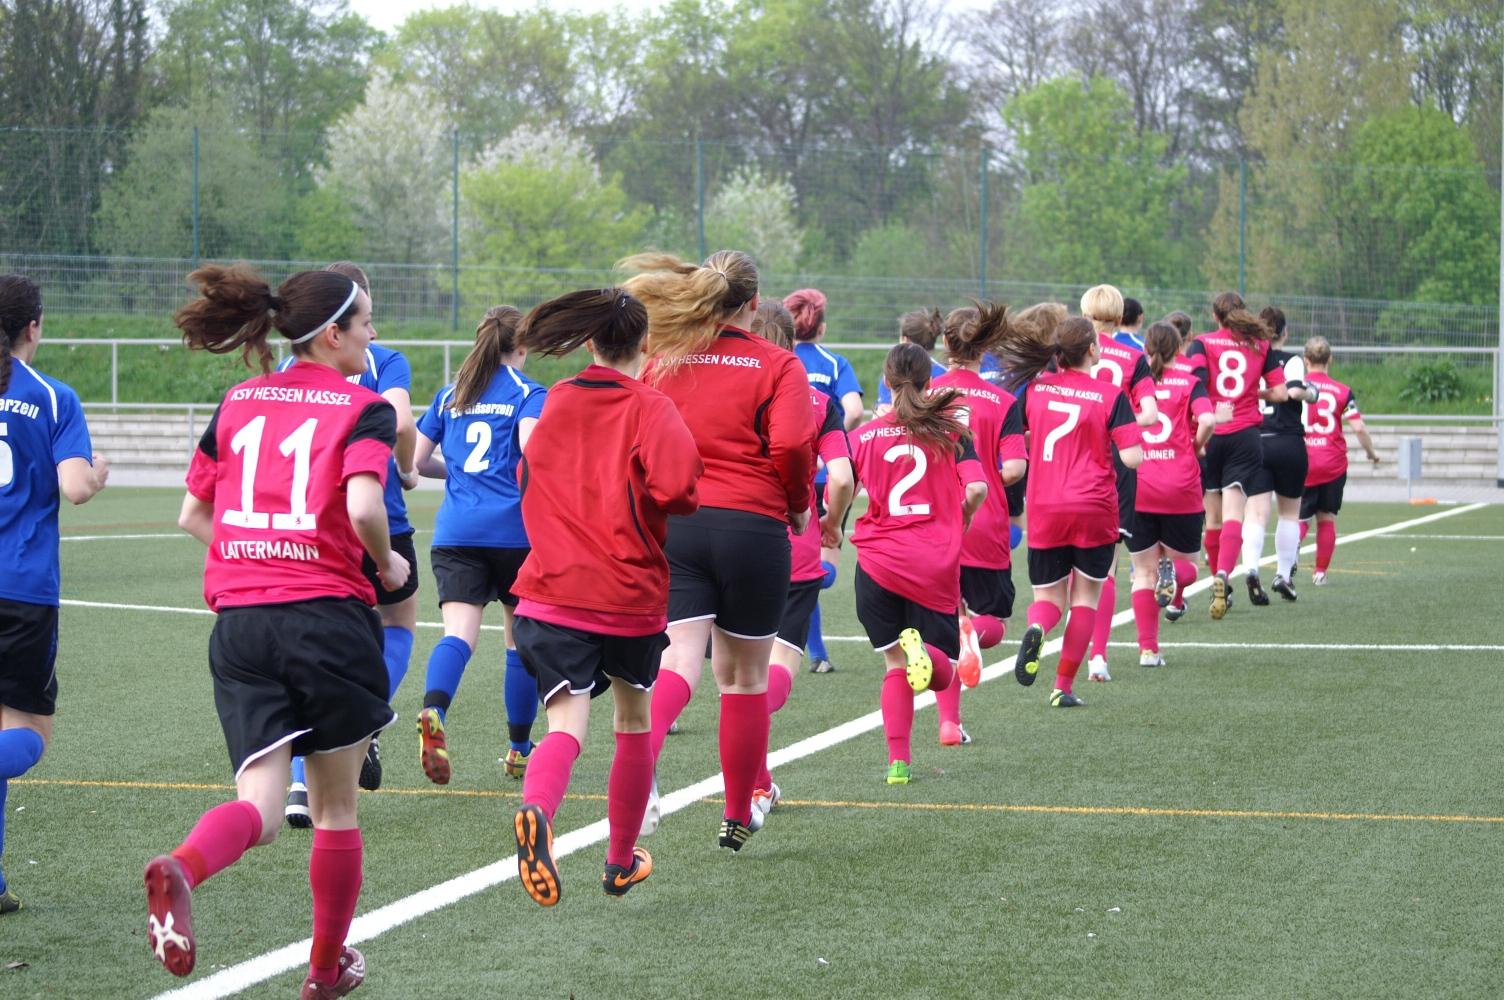 KSV Hessen Kassel Frauen - SV Gl�serzell II: Vor dem Anpfiff